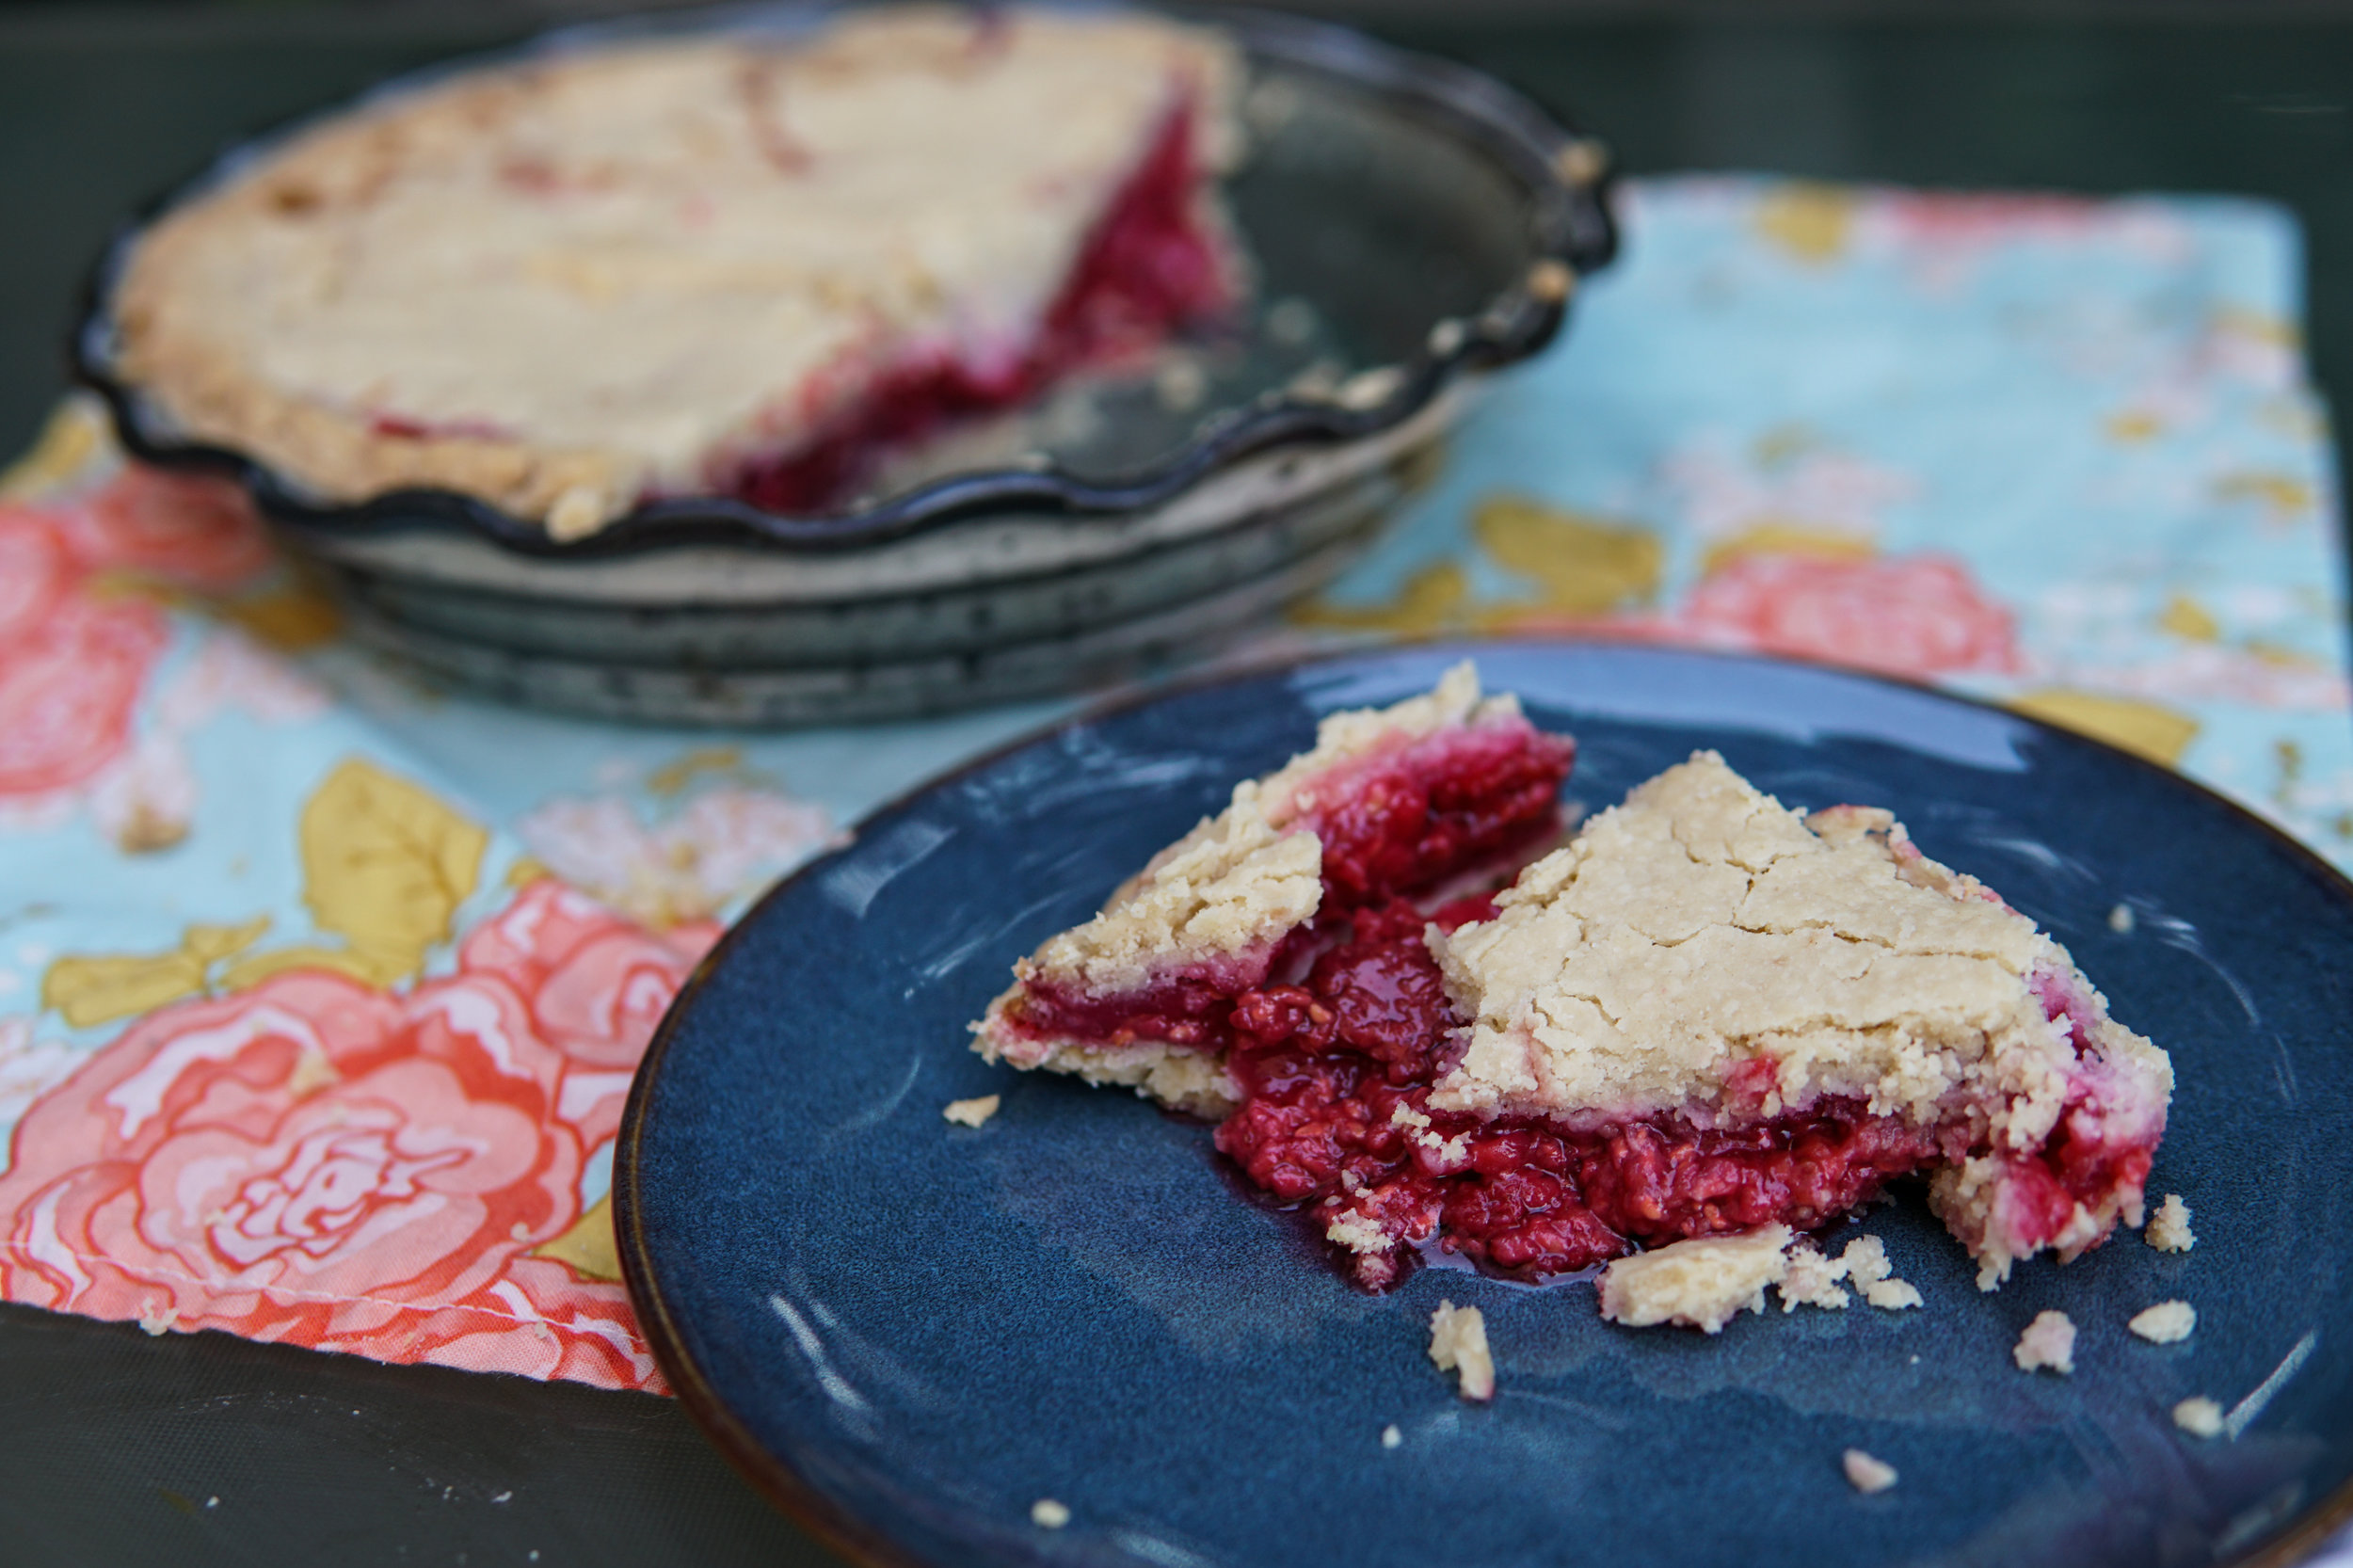 Raspberry pie gluten free delicious simple.jpg